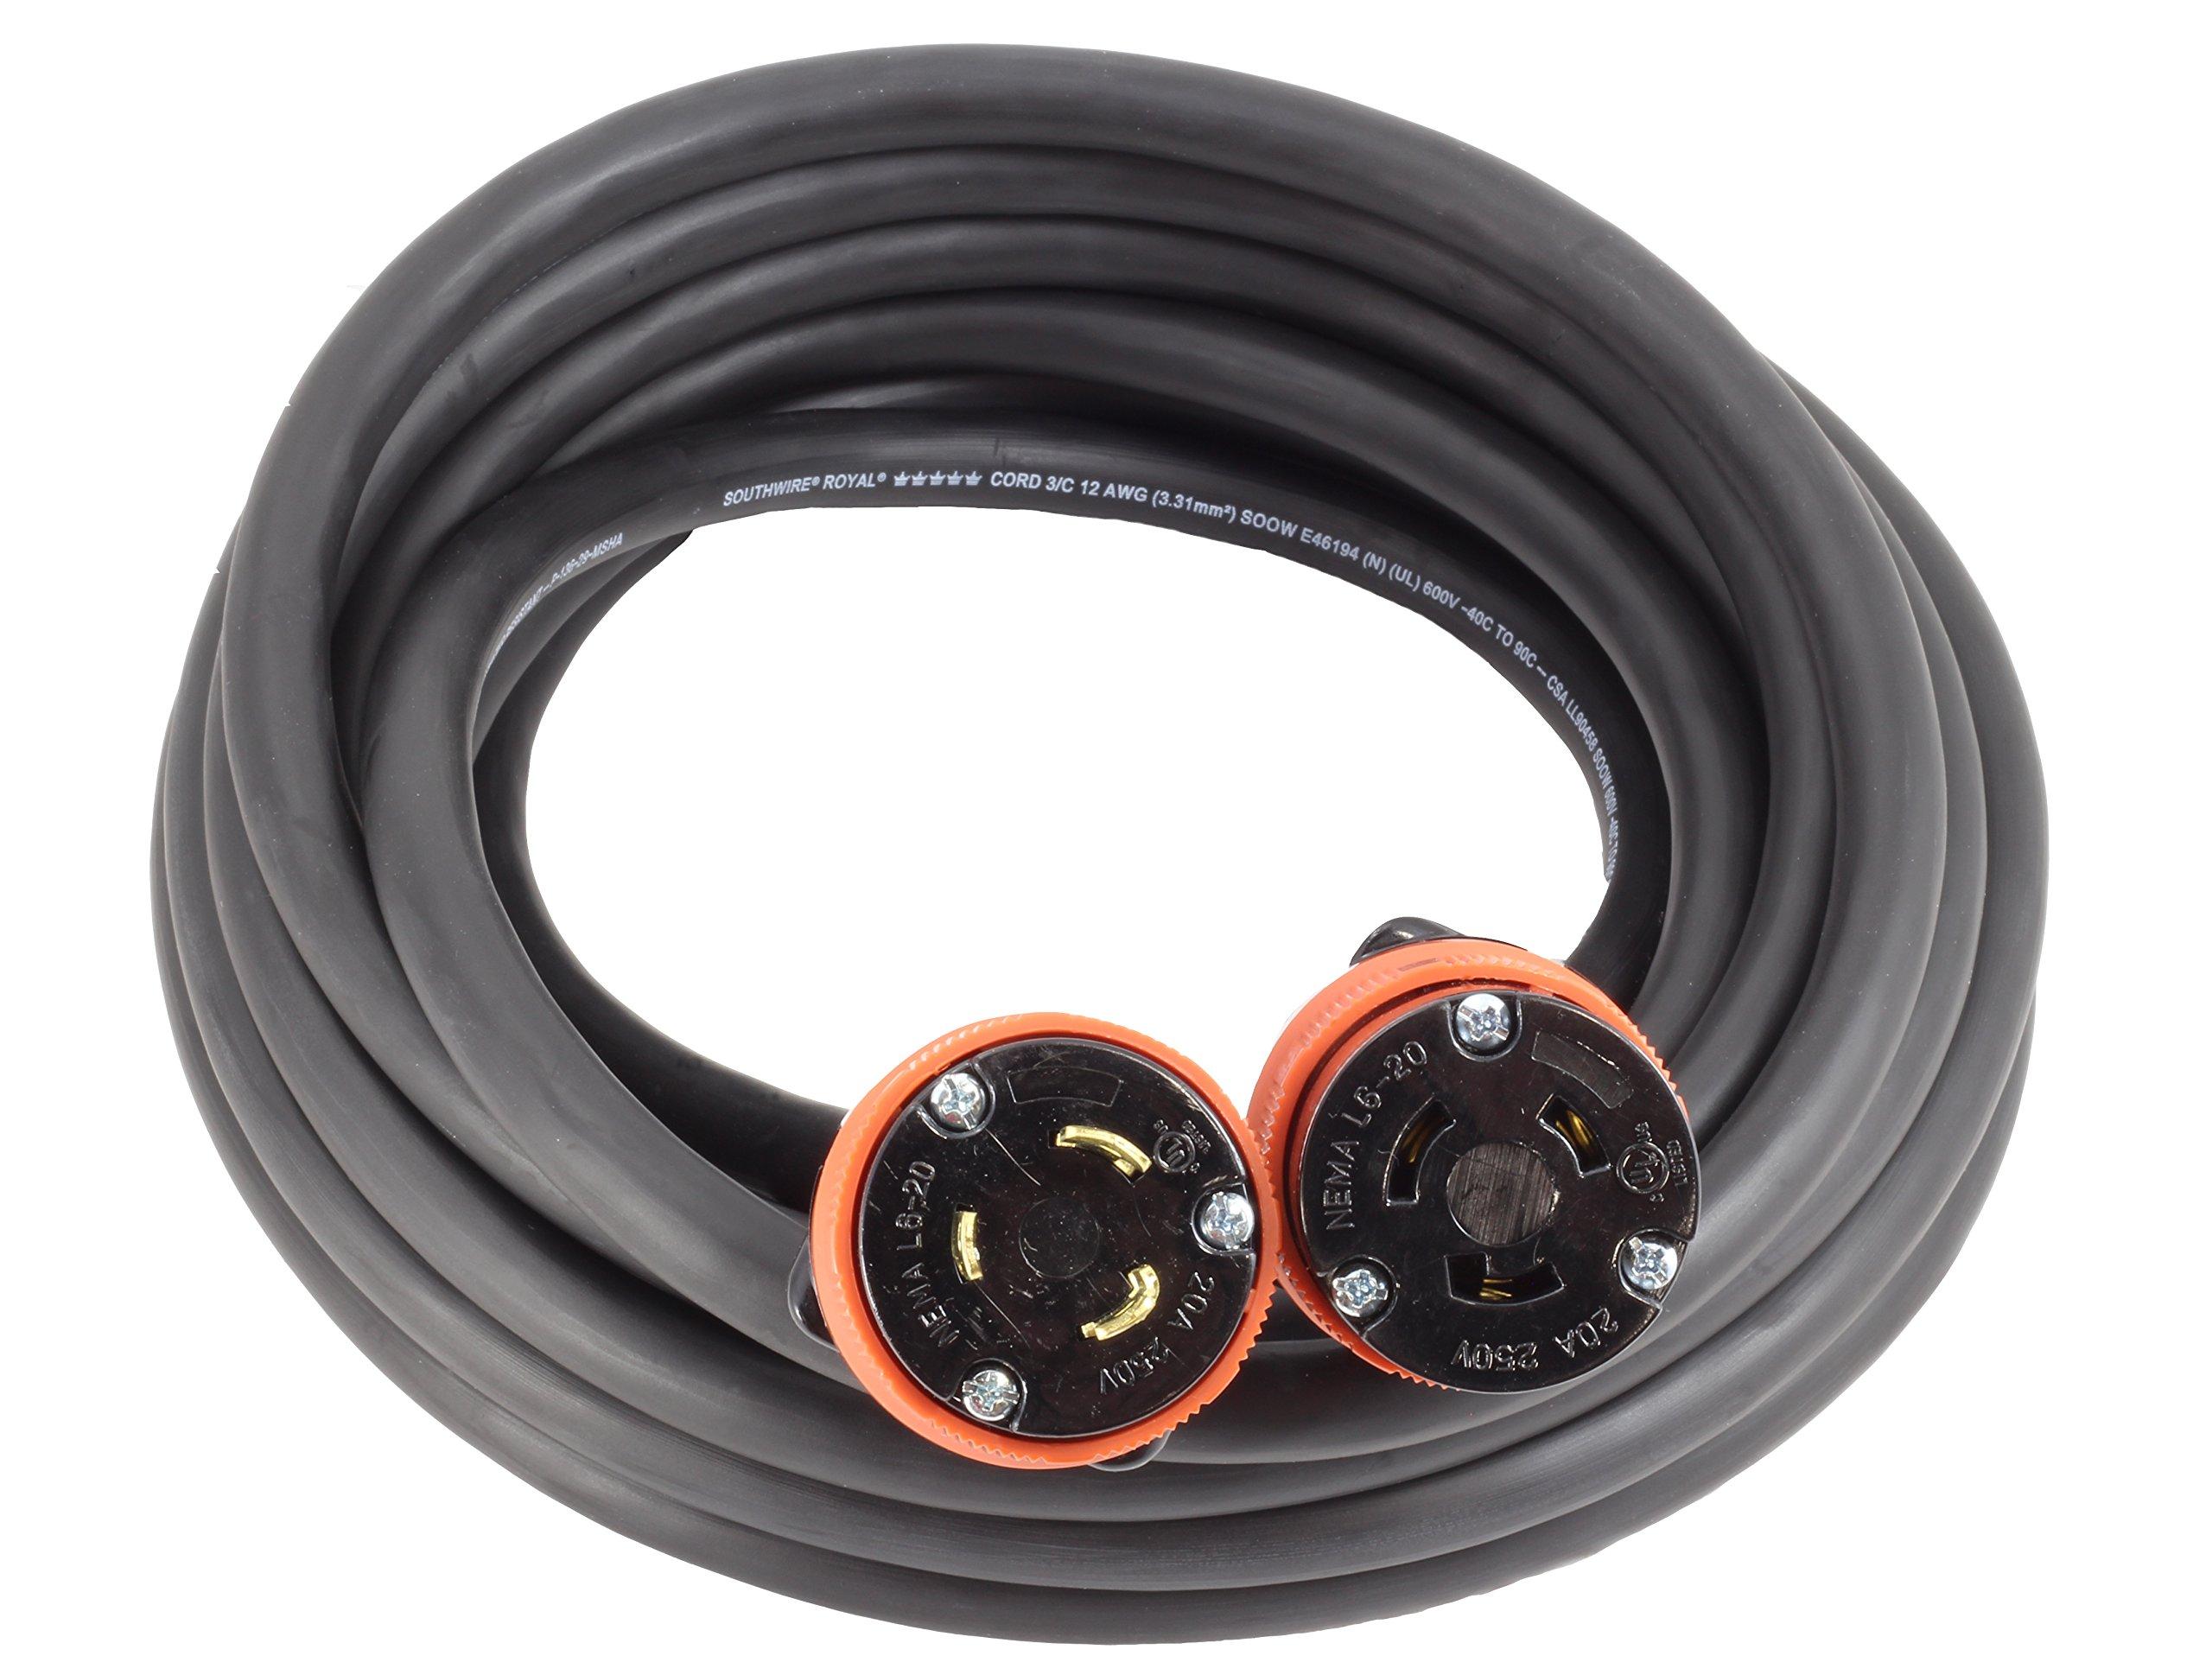 AC WORKS [L620PR-100] 100FT SOOW 12/3 NEMA L6-20 20Amp 250Volt Generator Rubber Extension Cord